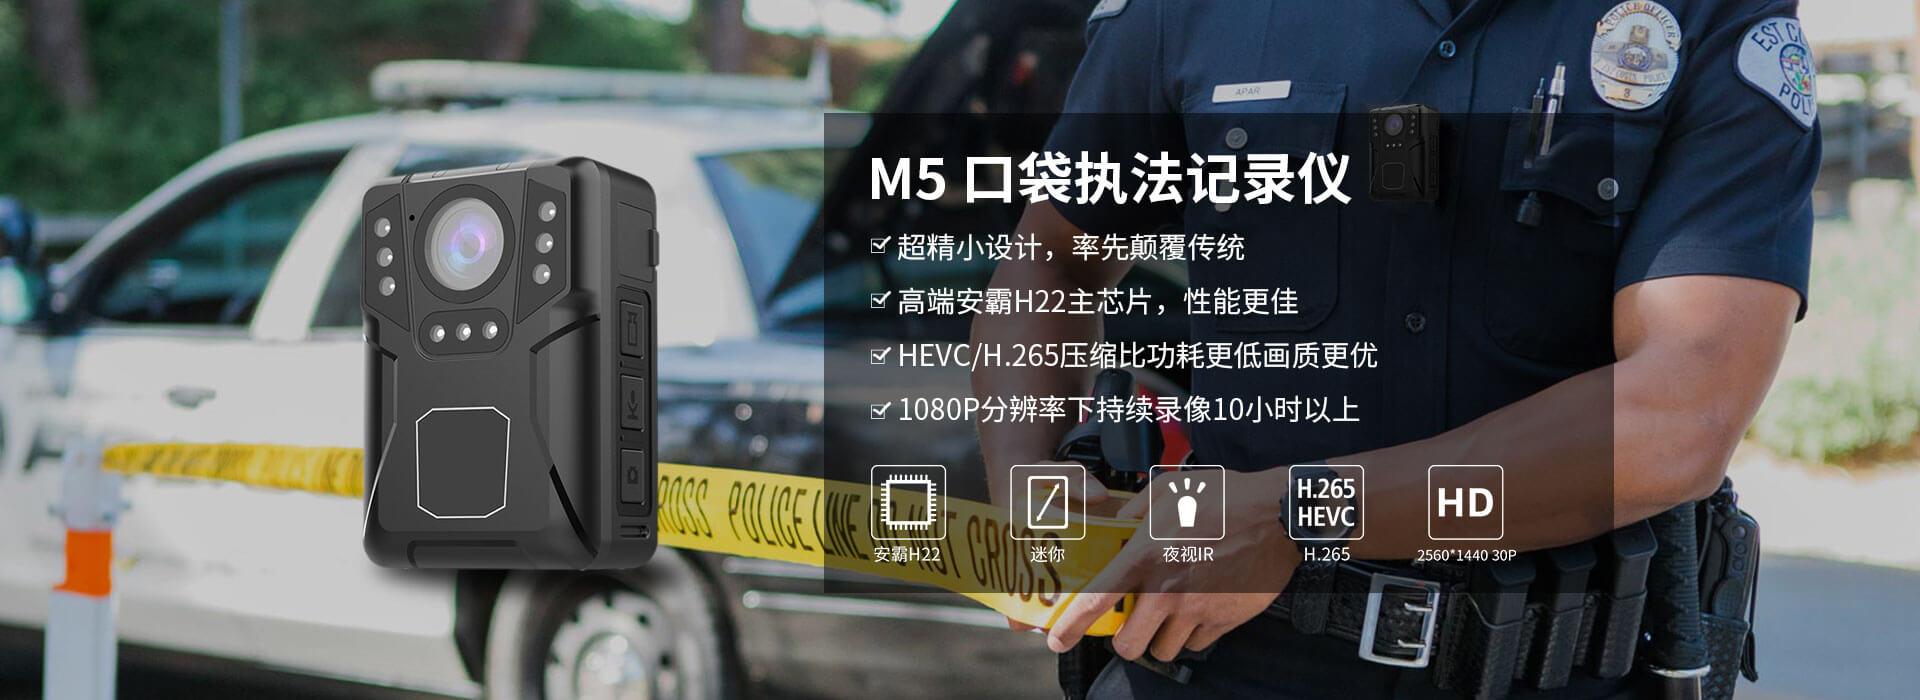 M5口袋执法记录仪